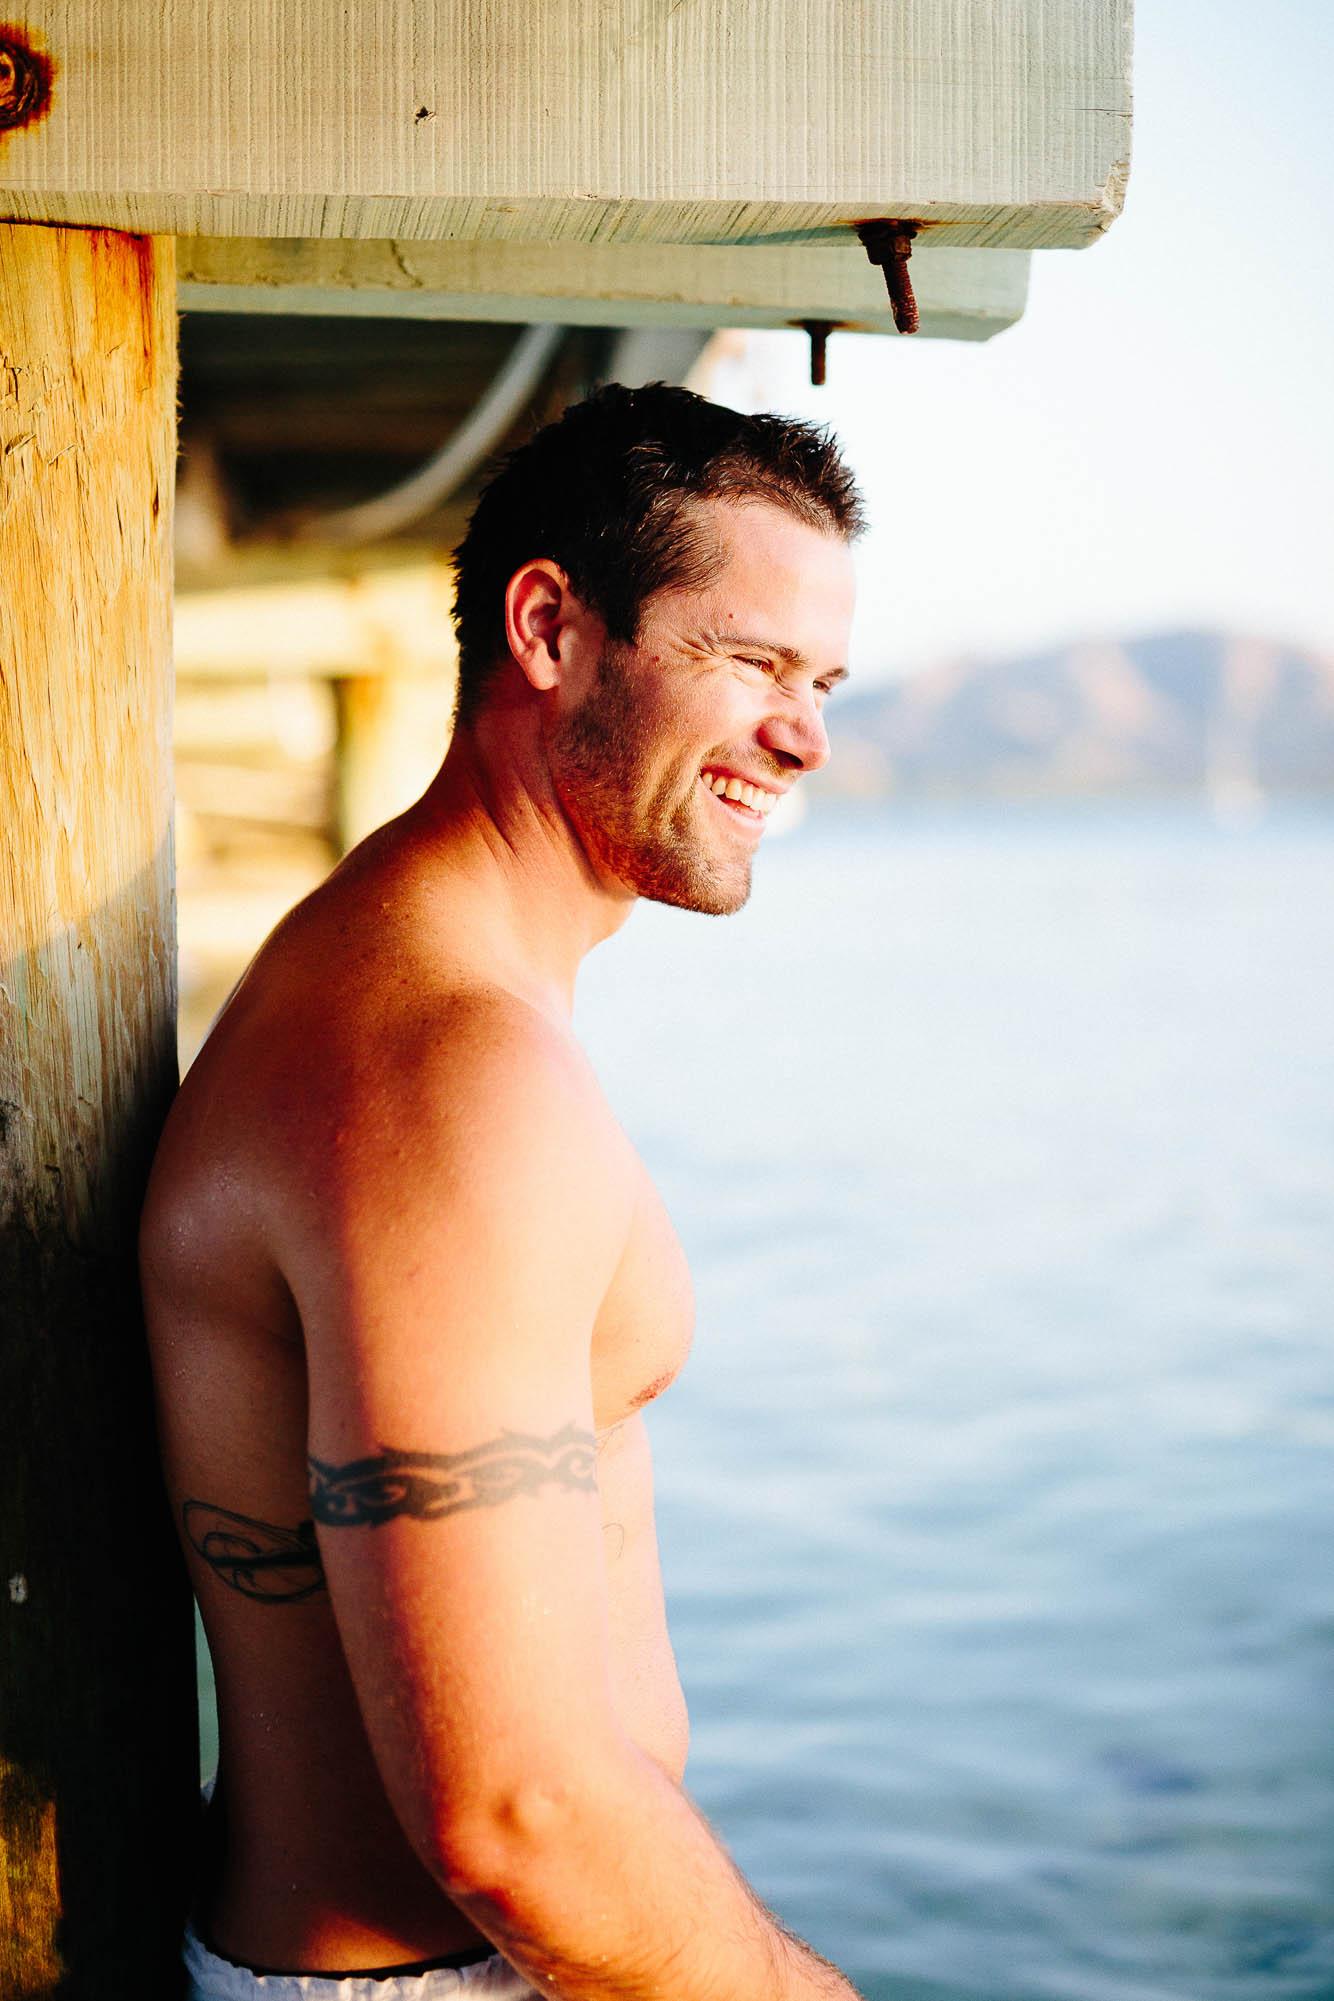 Groom shirtless under the pier